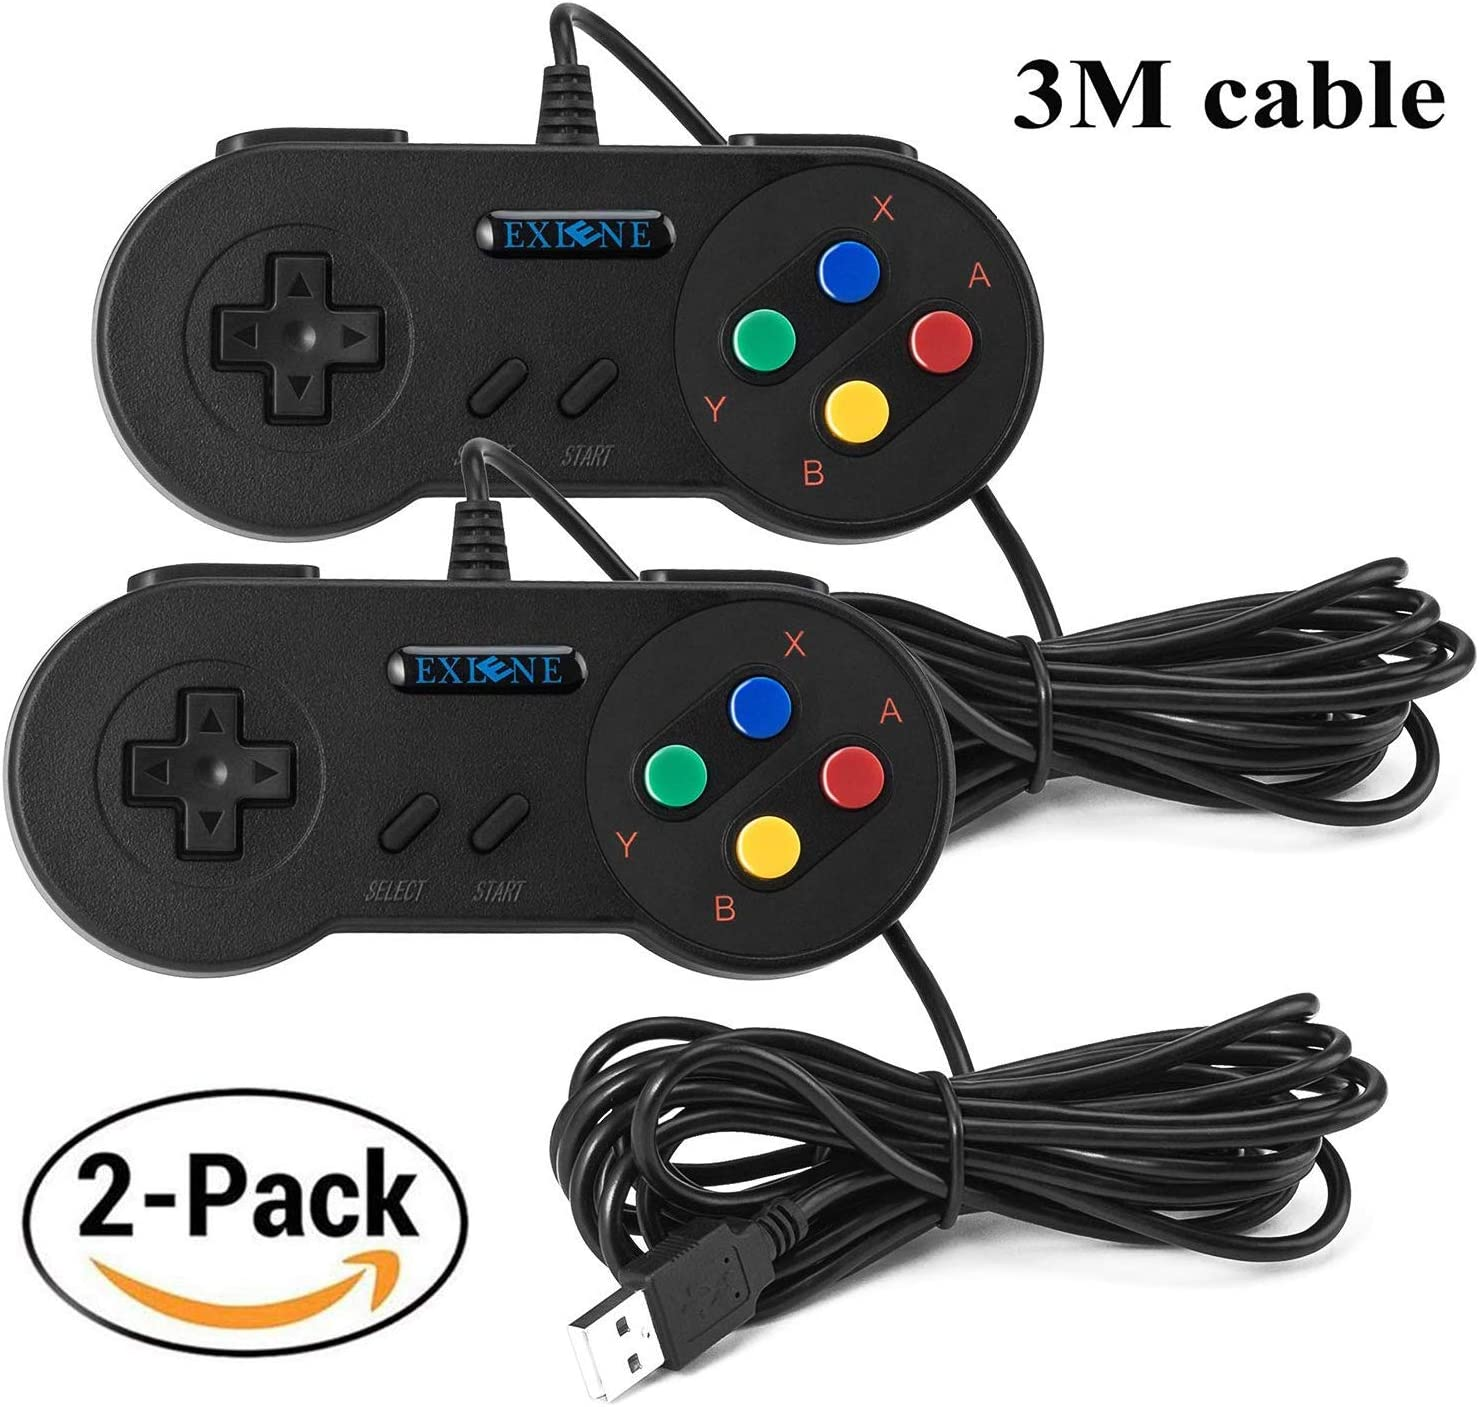 Amazon.com: Exlene® Usb Controller Gamepads Joystick 10ft/3m ...